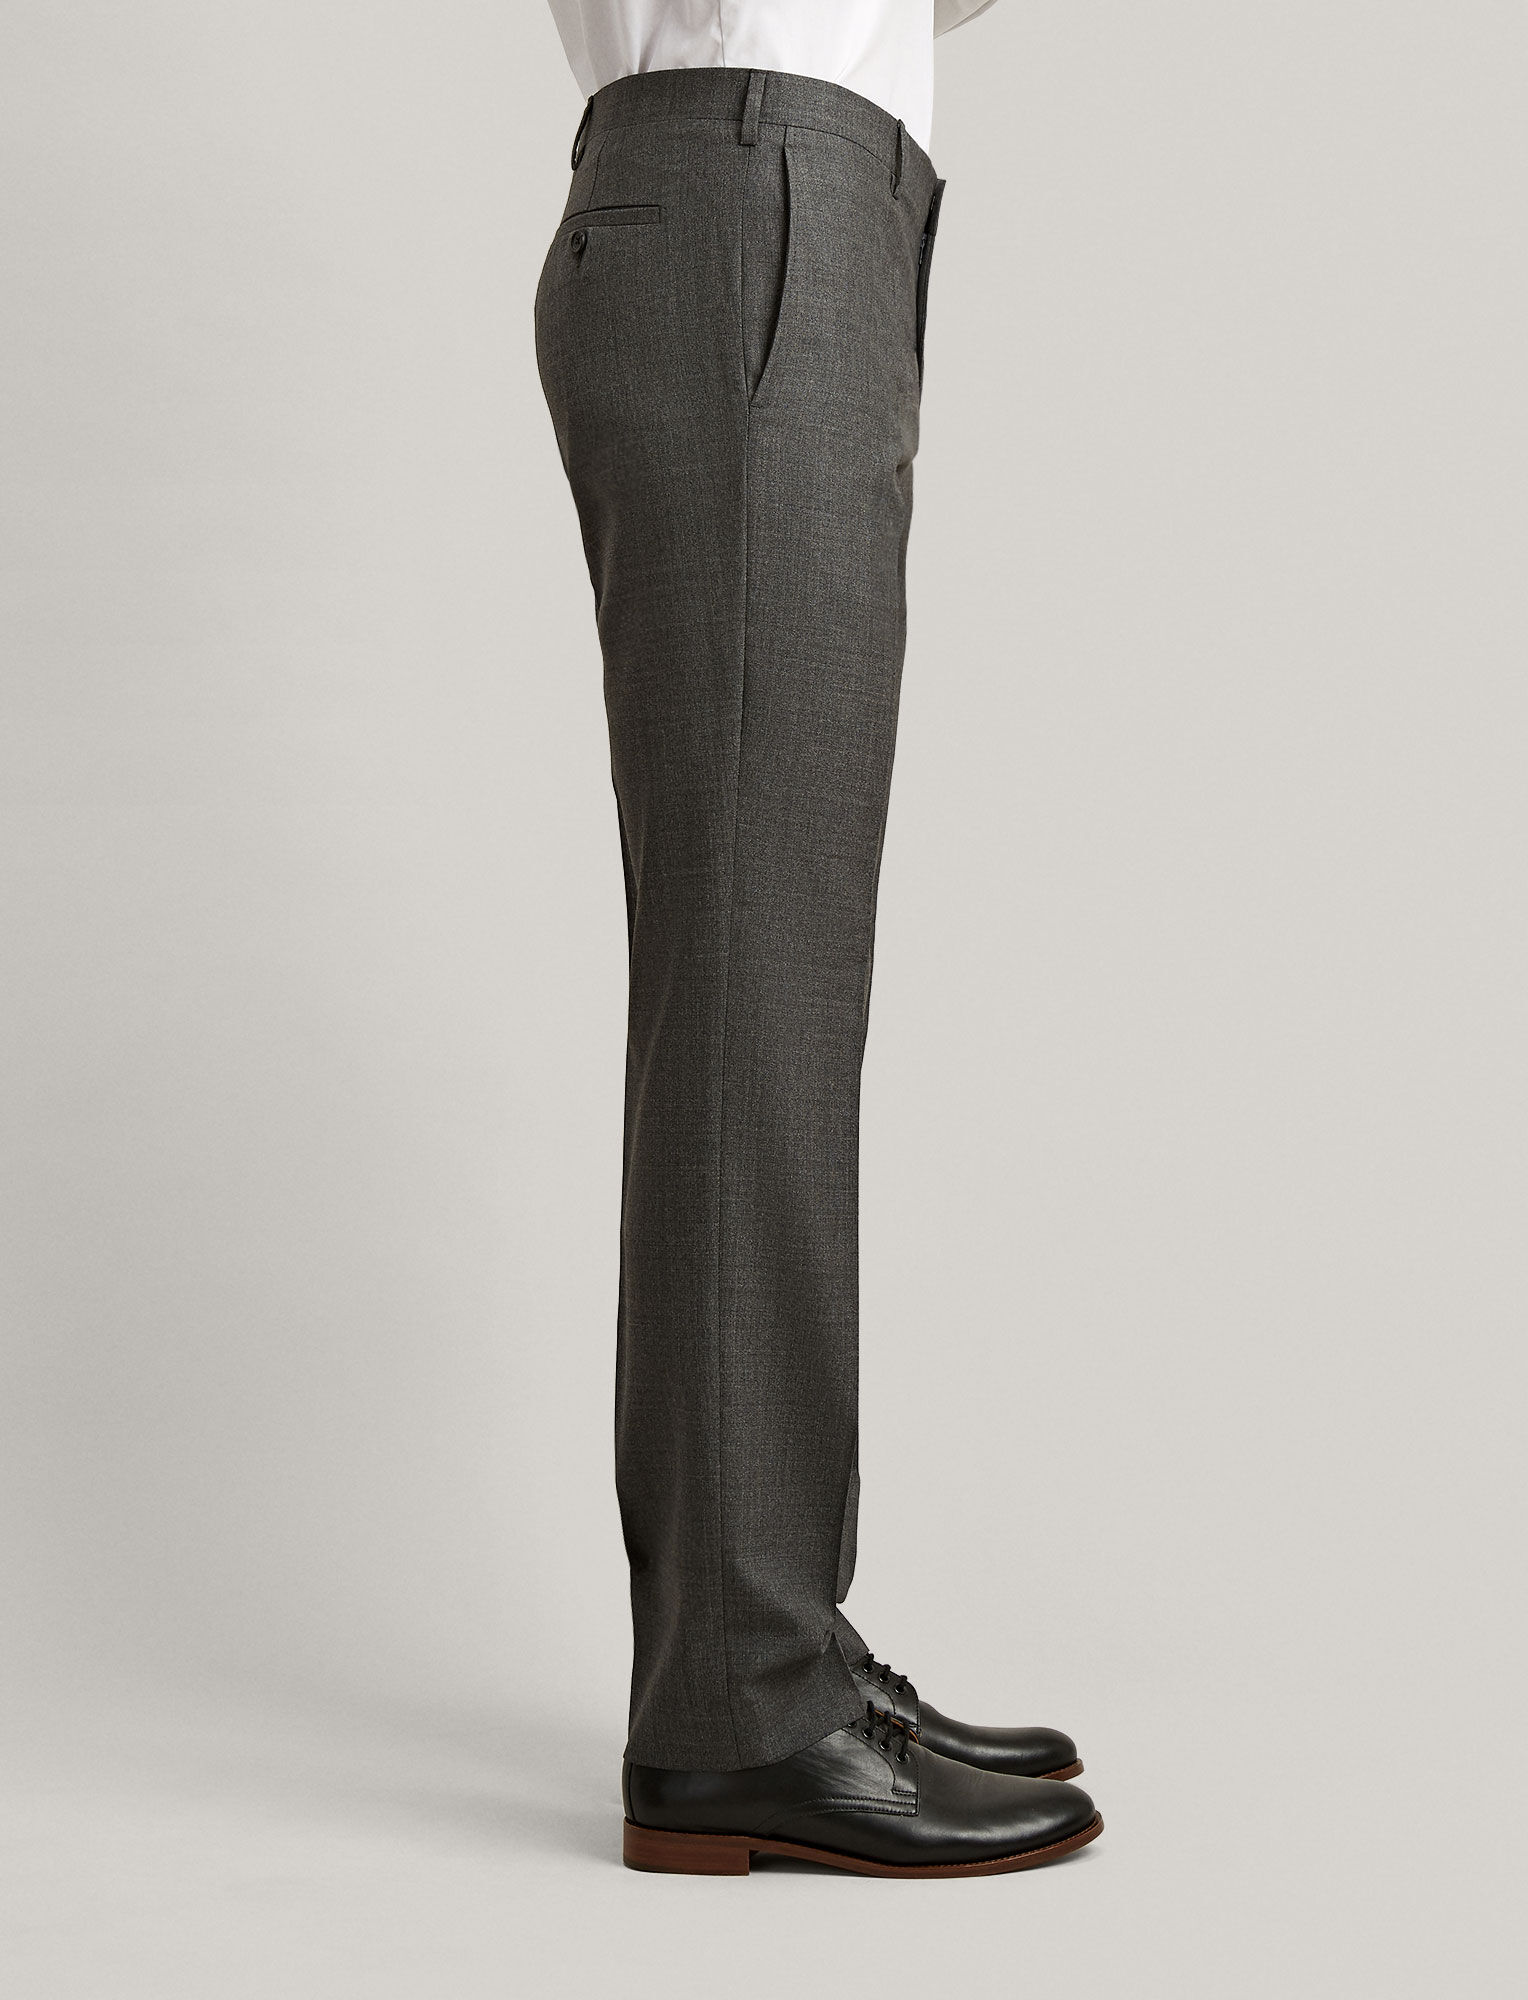 Joseph, Pantalon de costume Darwin en laine tropicale, in GREY